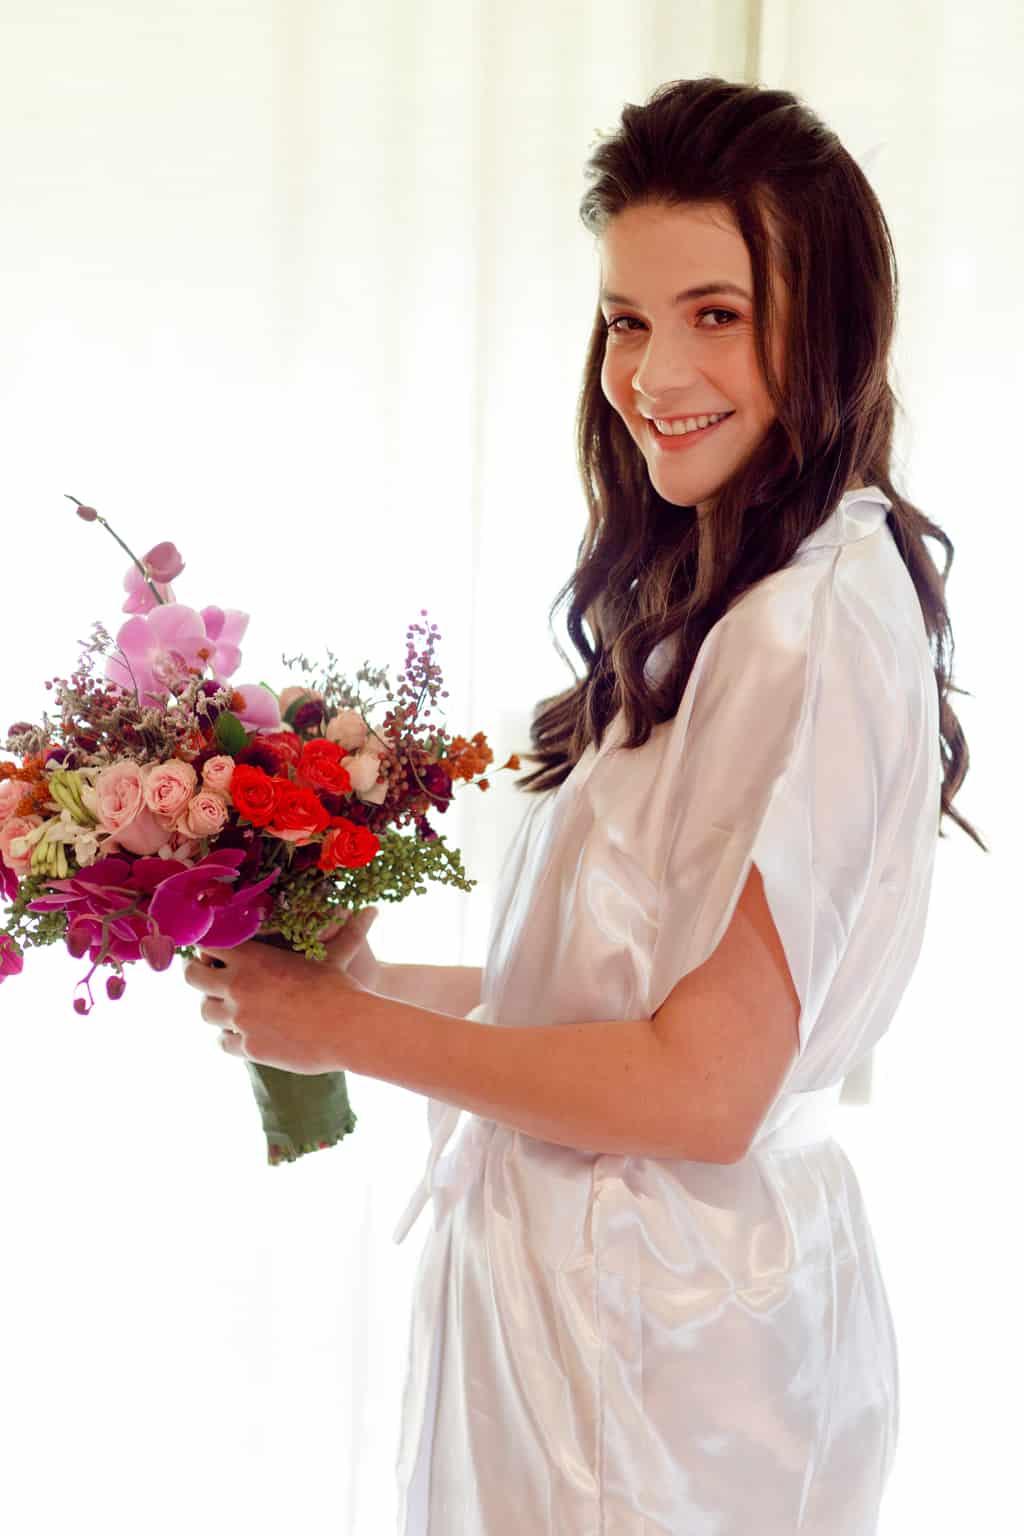 Casamento-Emanuelle-e-Alysson-Fotografia-Tadeu-Nanó-e-Luca-Antunes-334